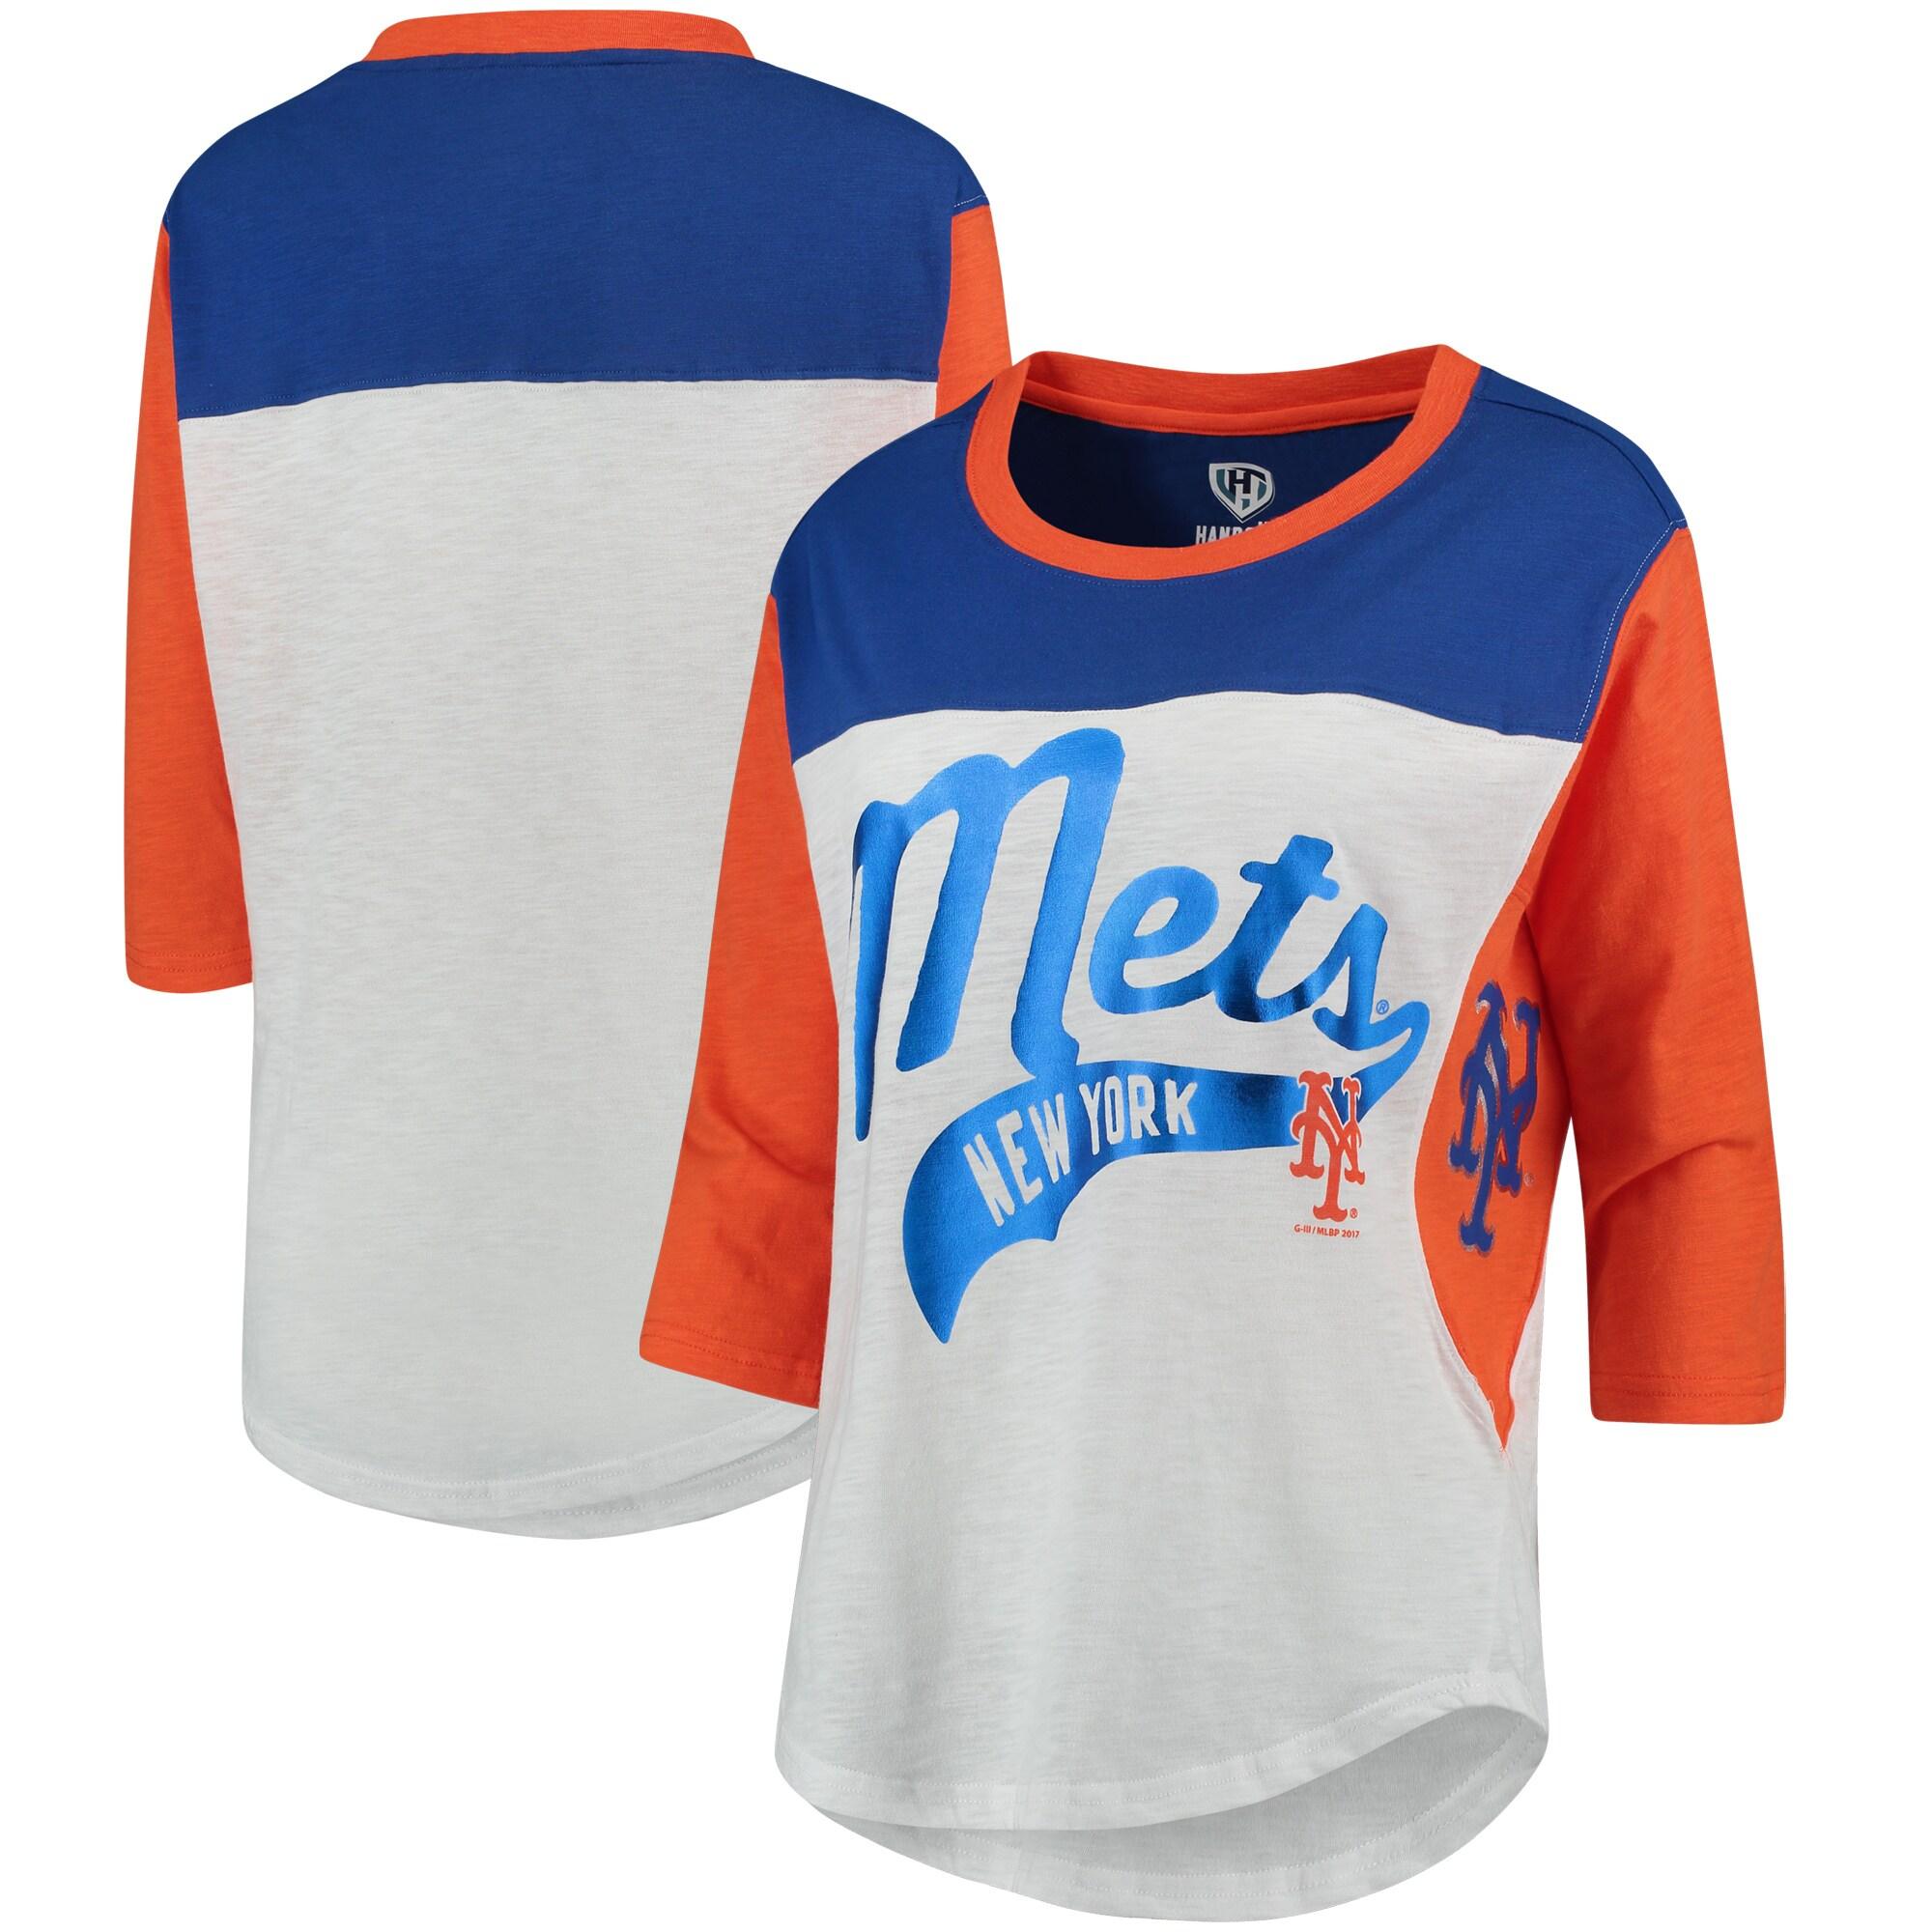 New York Mets Hands High Women's Season's Pass 3/4 Sleeve T-Shirt - White